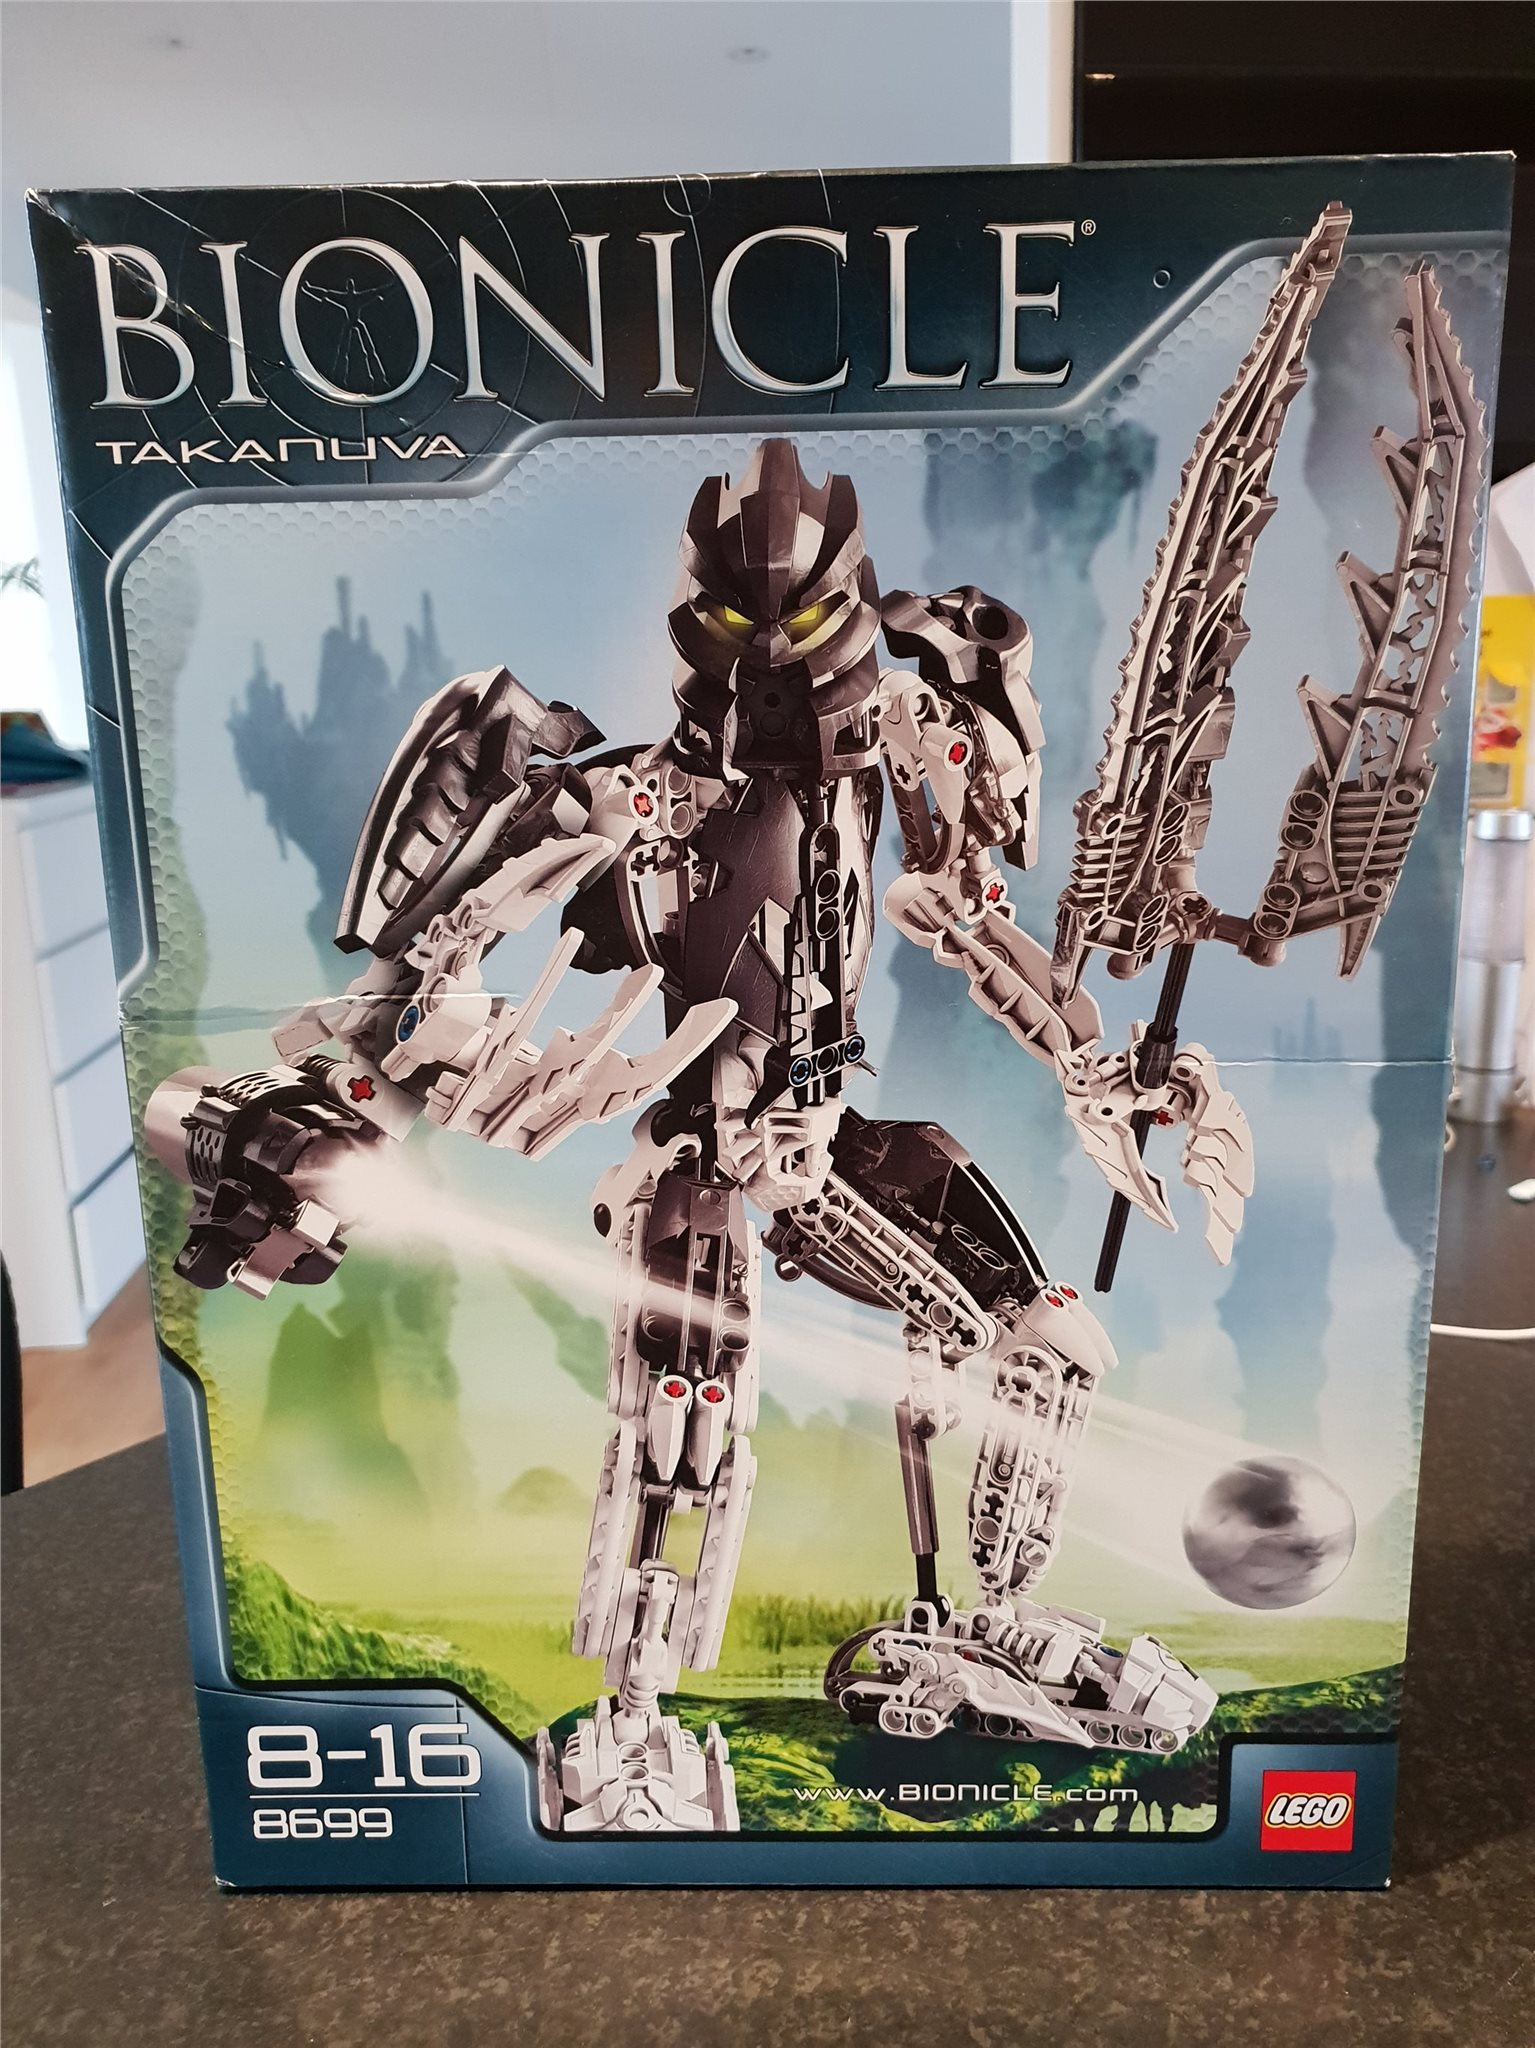 Lego Nytt Oöppnat  Lego Bionicle 8699 Takanuva